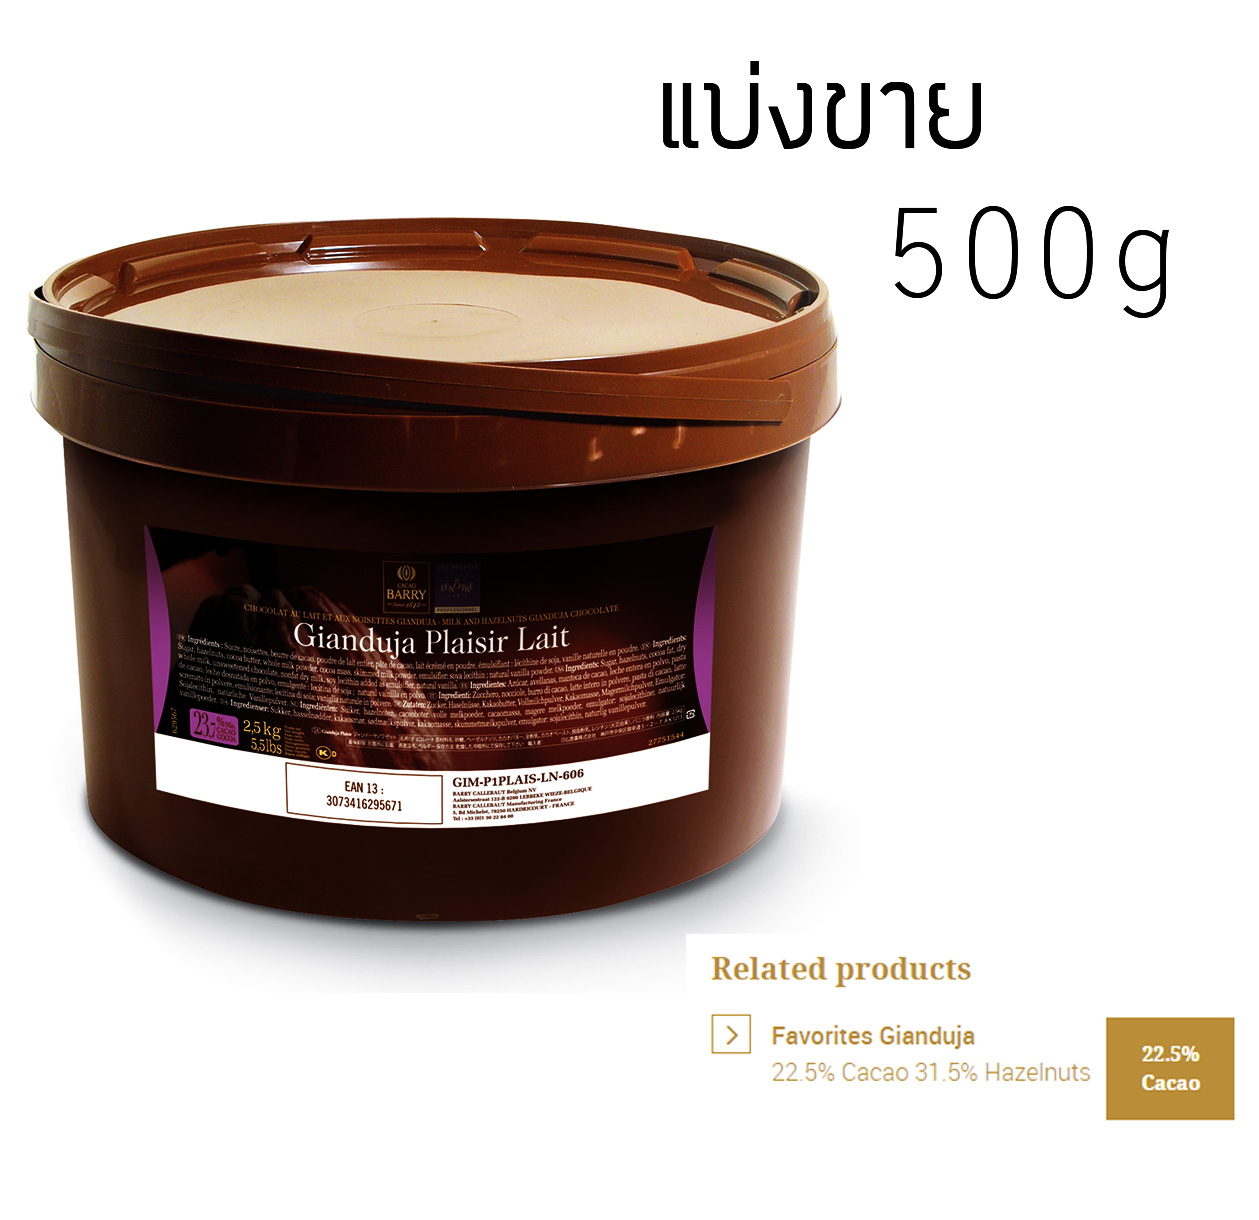 Cacao Barry Gianduja Plaisir : แบ่งขาย 500 g